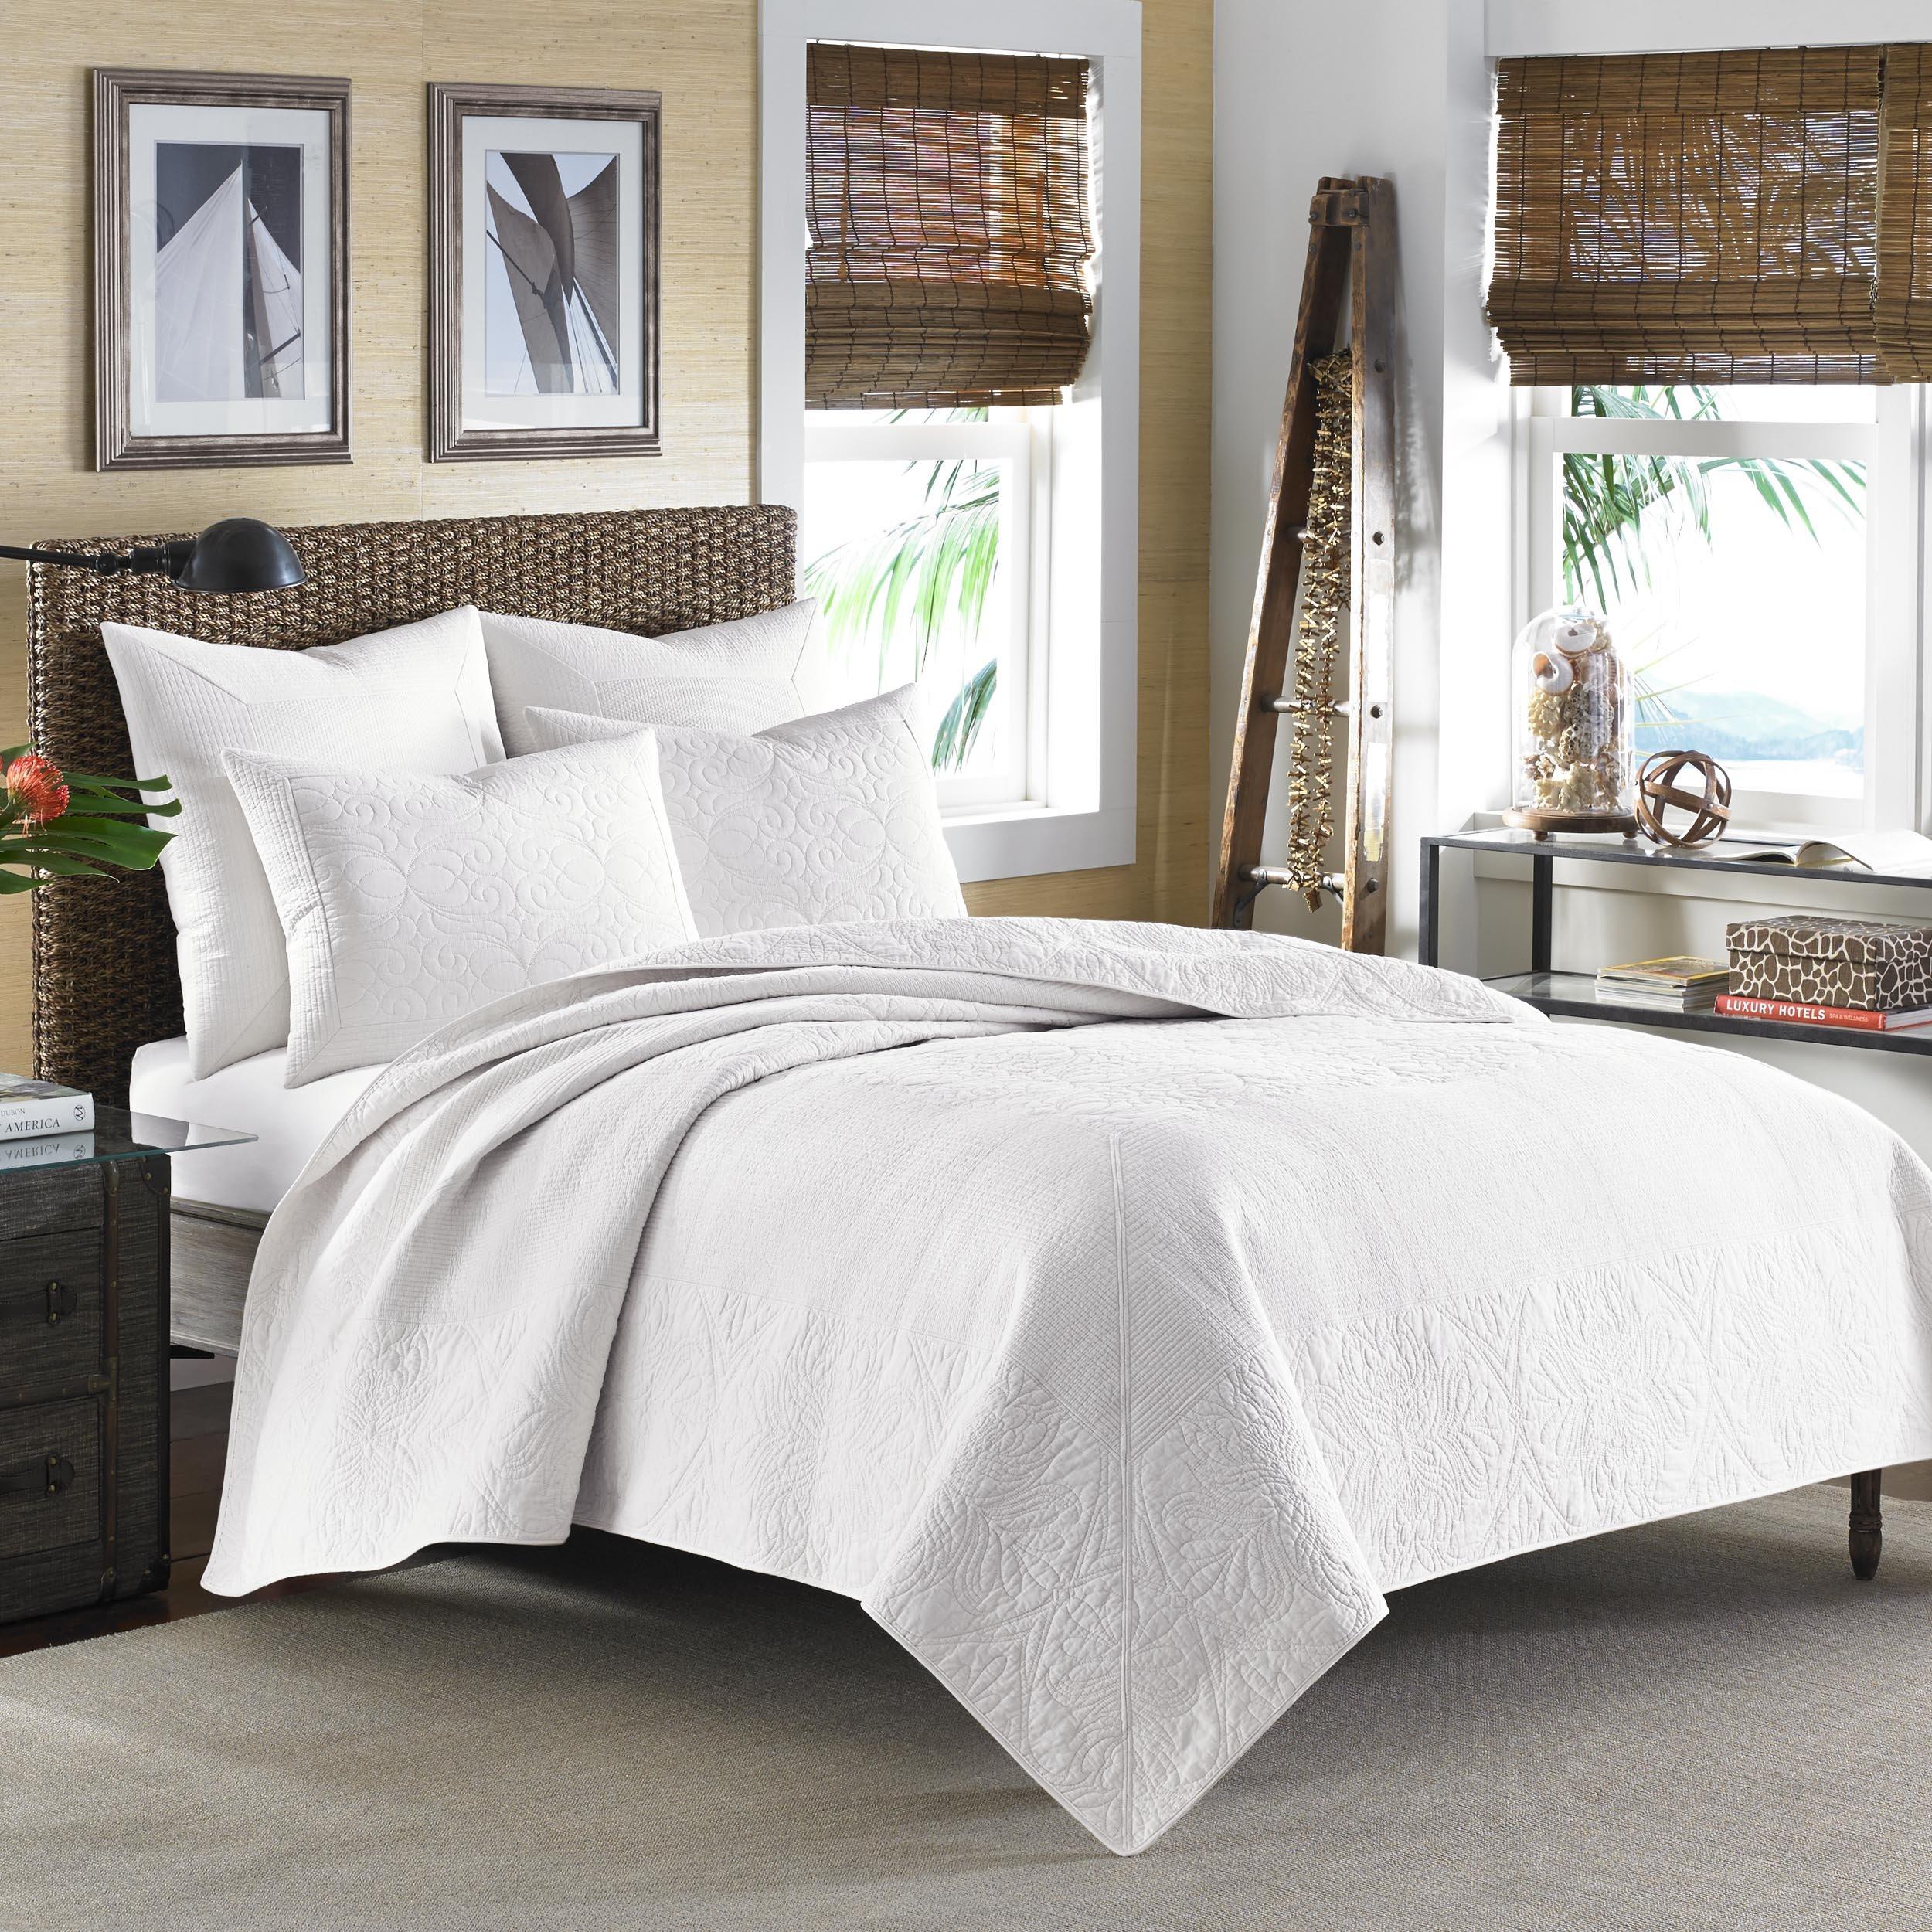 Tommy Bahama Nassau White Quilt ,Full/Queen